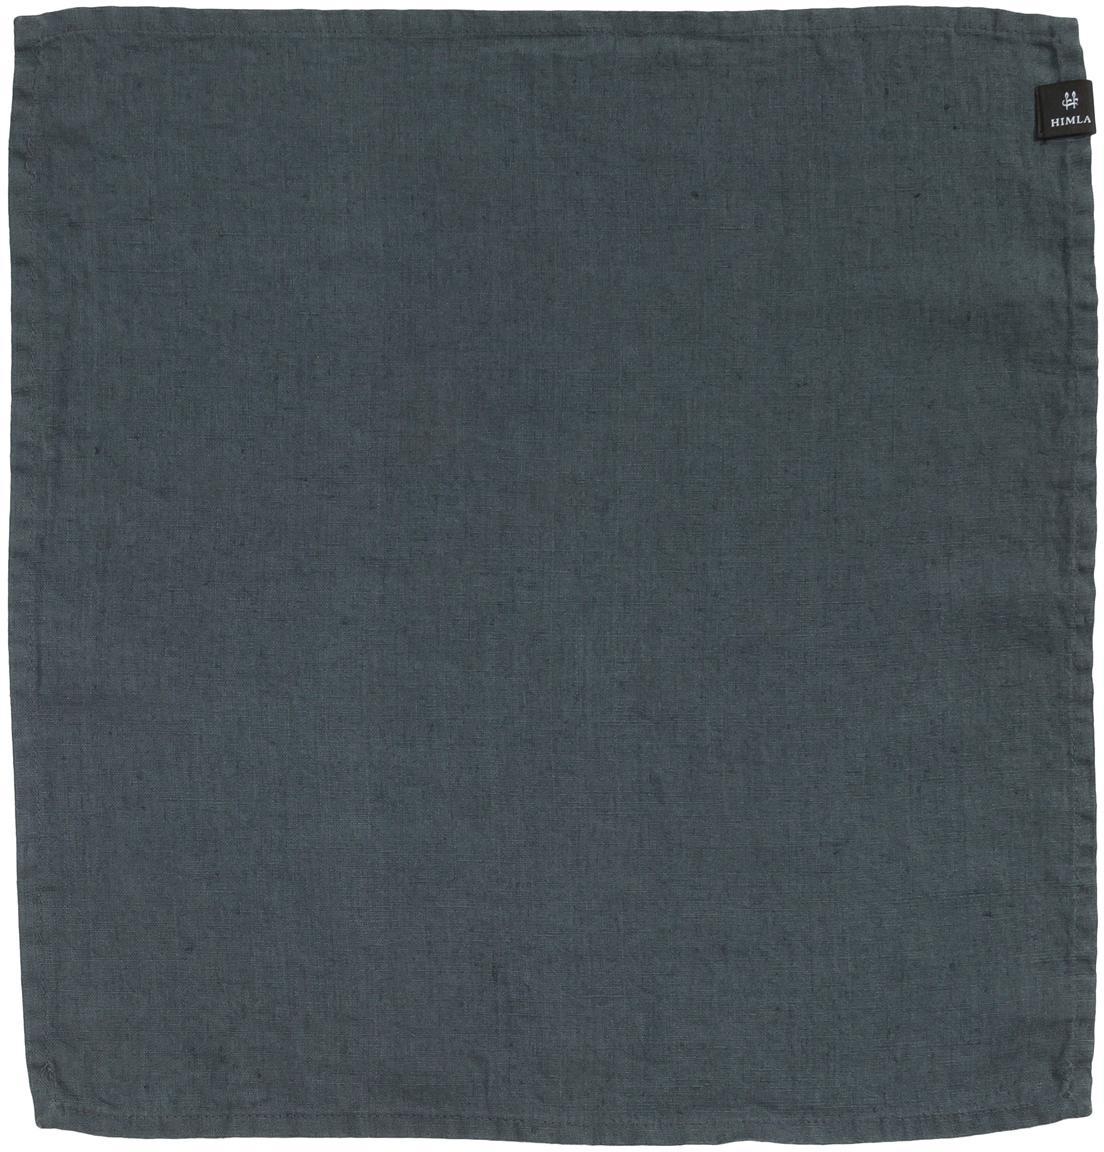 Servilletas de lino Sunshine, 4uds., Lino, Gris oscuro, L 45 x An 45 cm